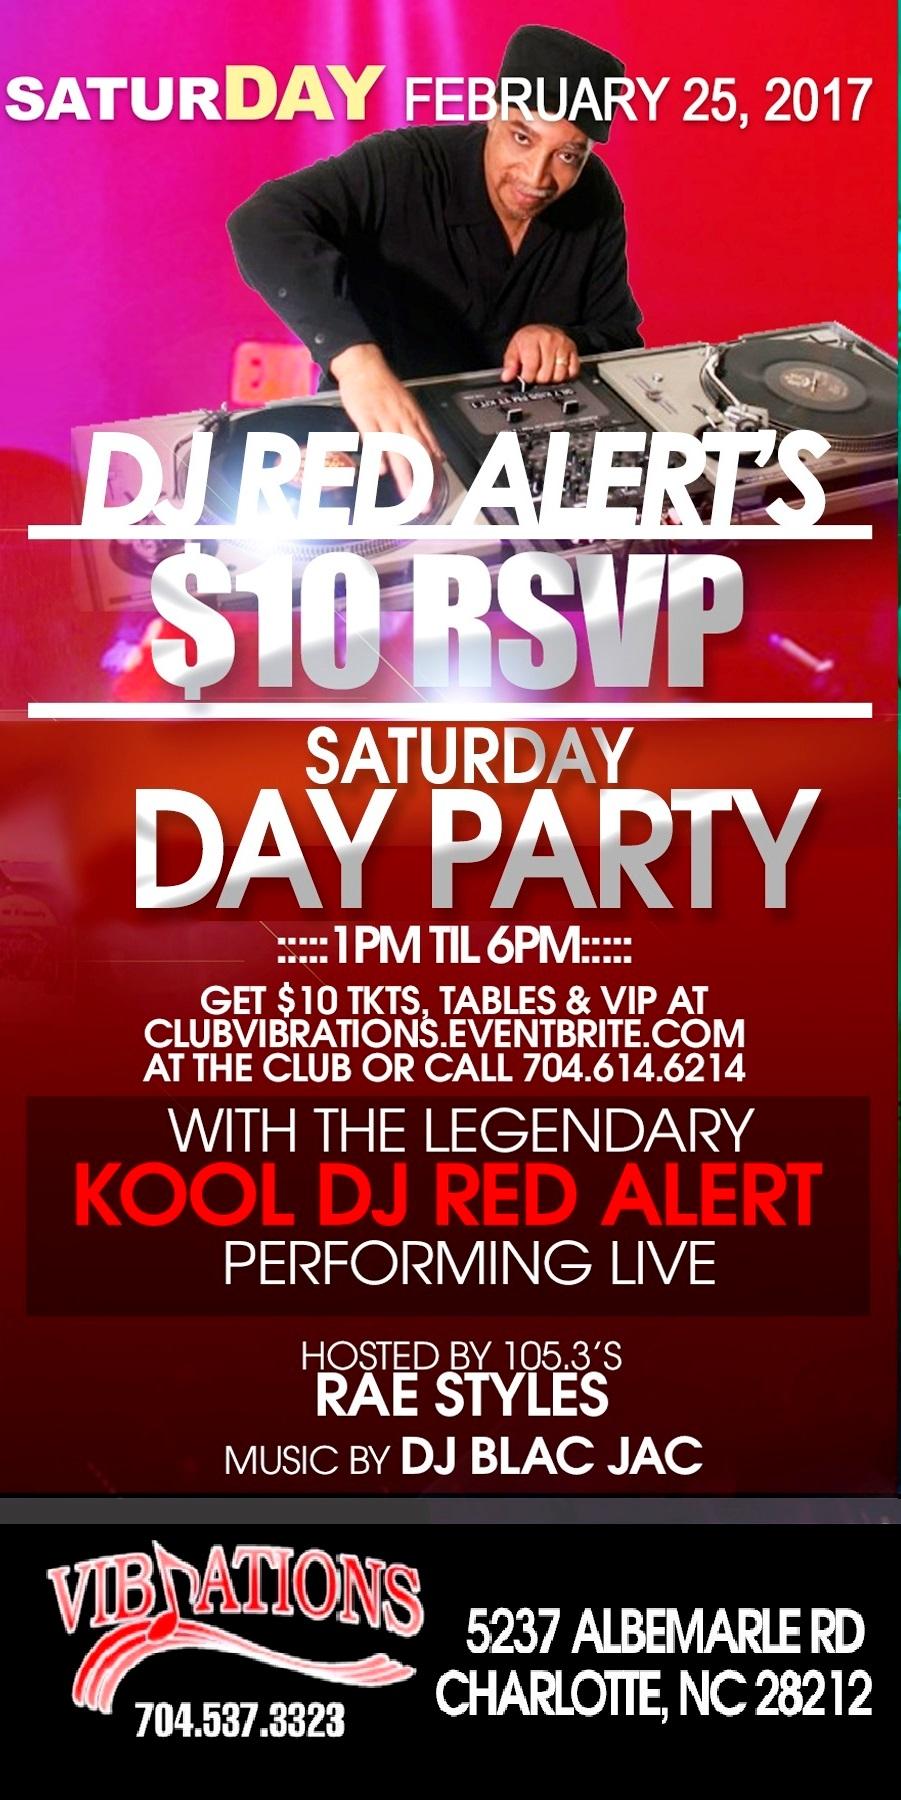 DJ RED ALERT's $10 RSVP SATURDAY DAY PARTY Tickets, Sat ...